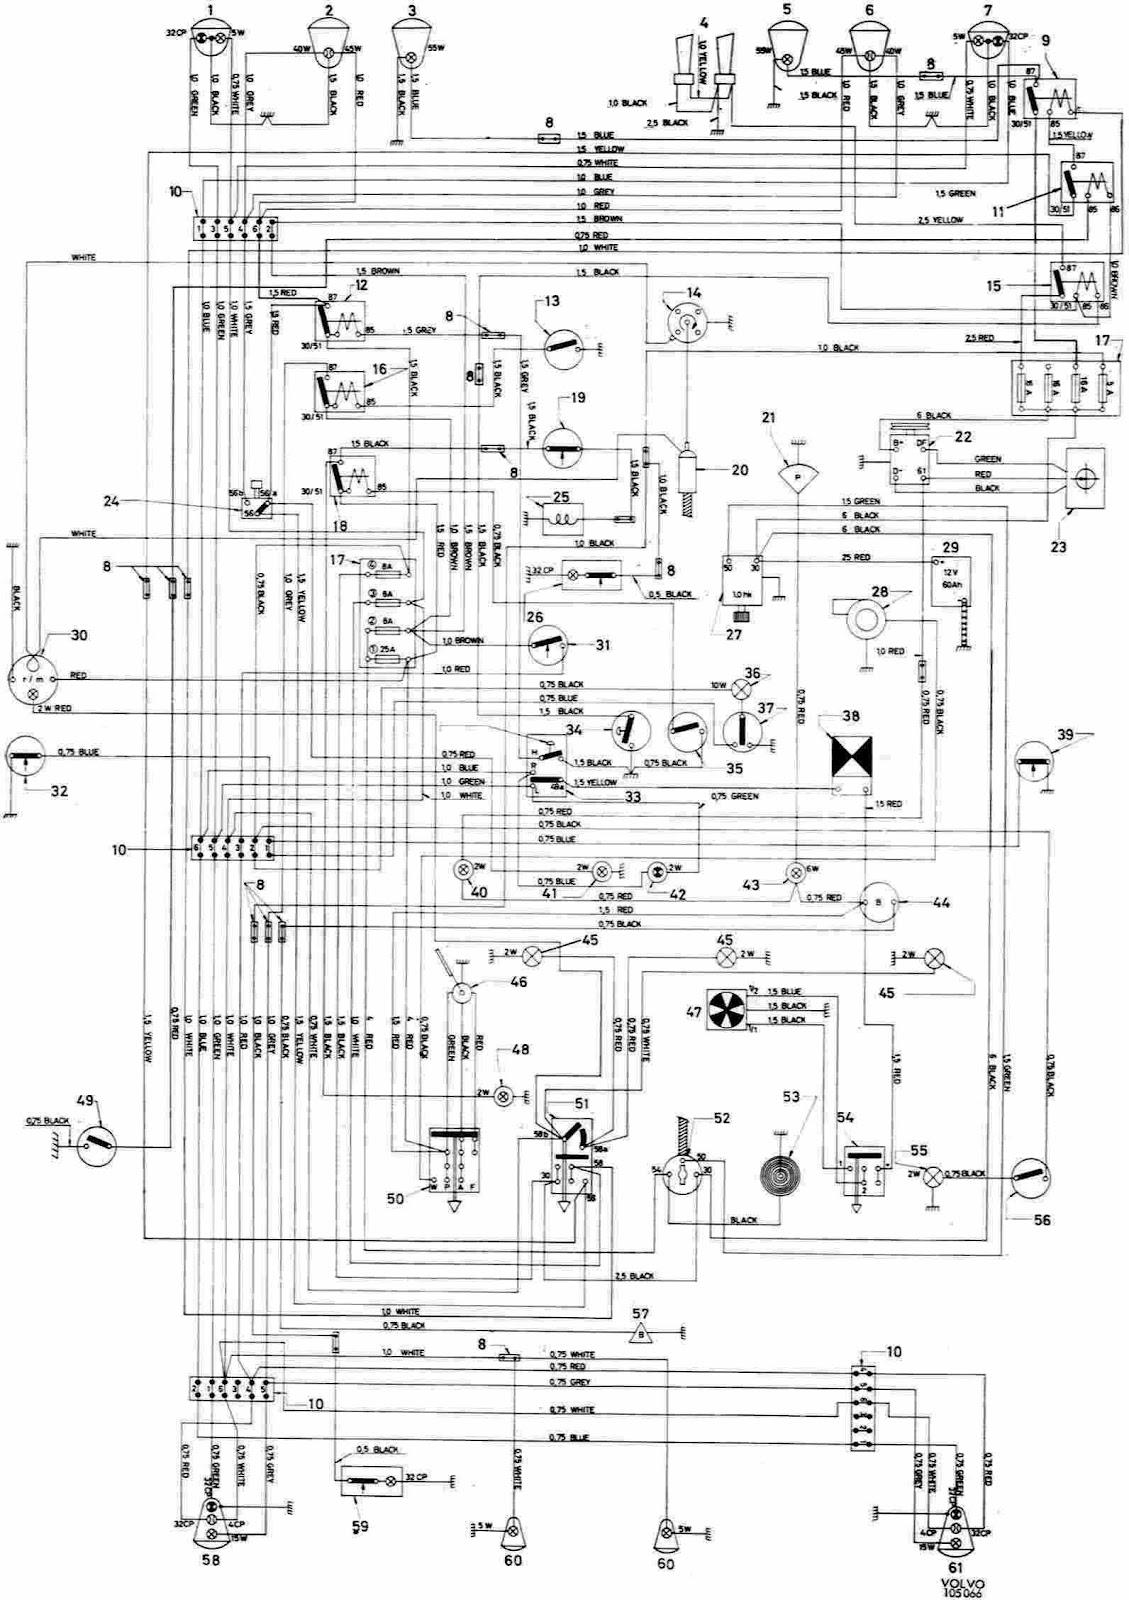 2006 Volvo S40 Wiring Diagram | lush-future wiring diagram export |  lush-future.zerinolgola.it | Volvo S40 Wiring Diagram |  | zerinolgola.it